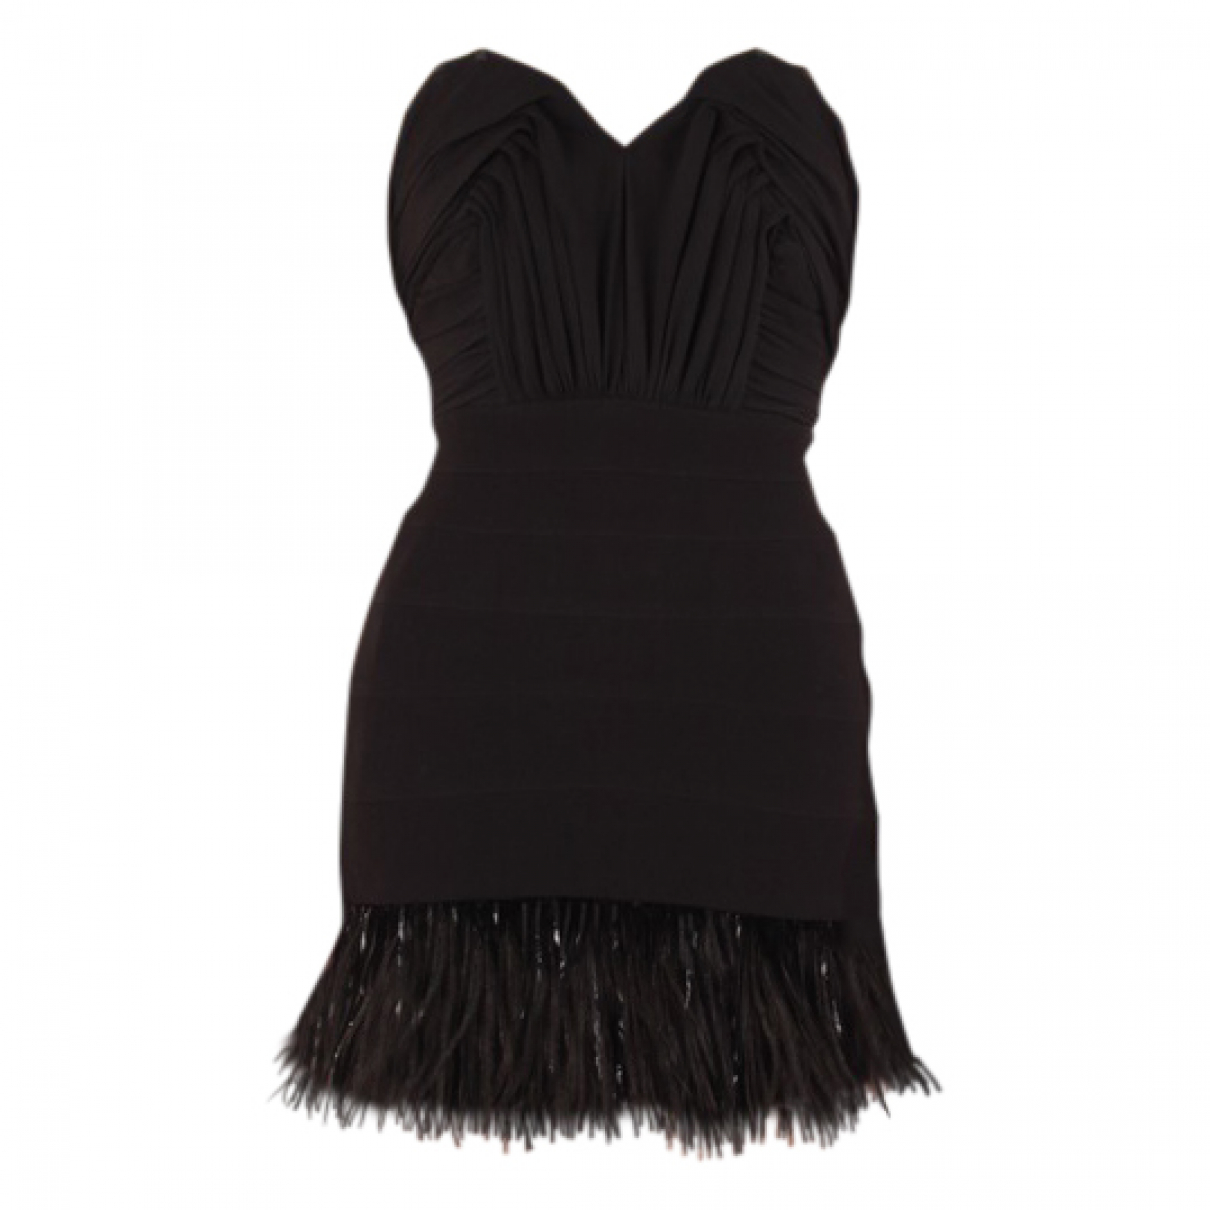 Balmain \N Black Cotton dress for Women 36 FR